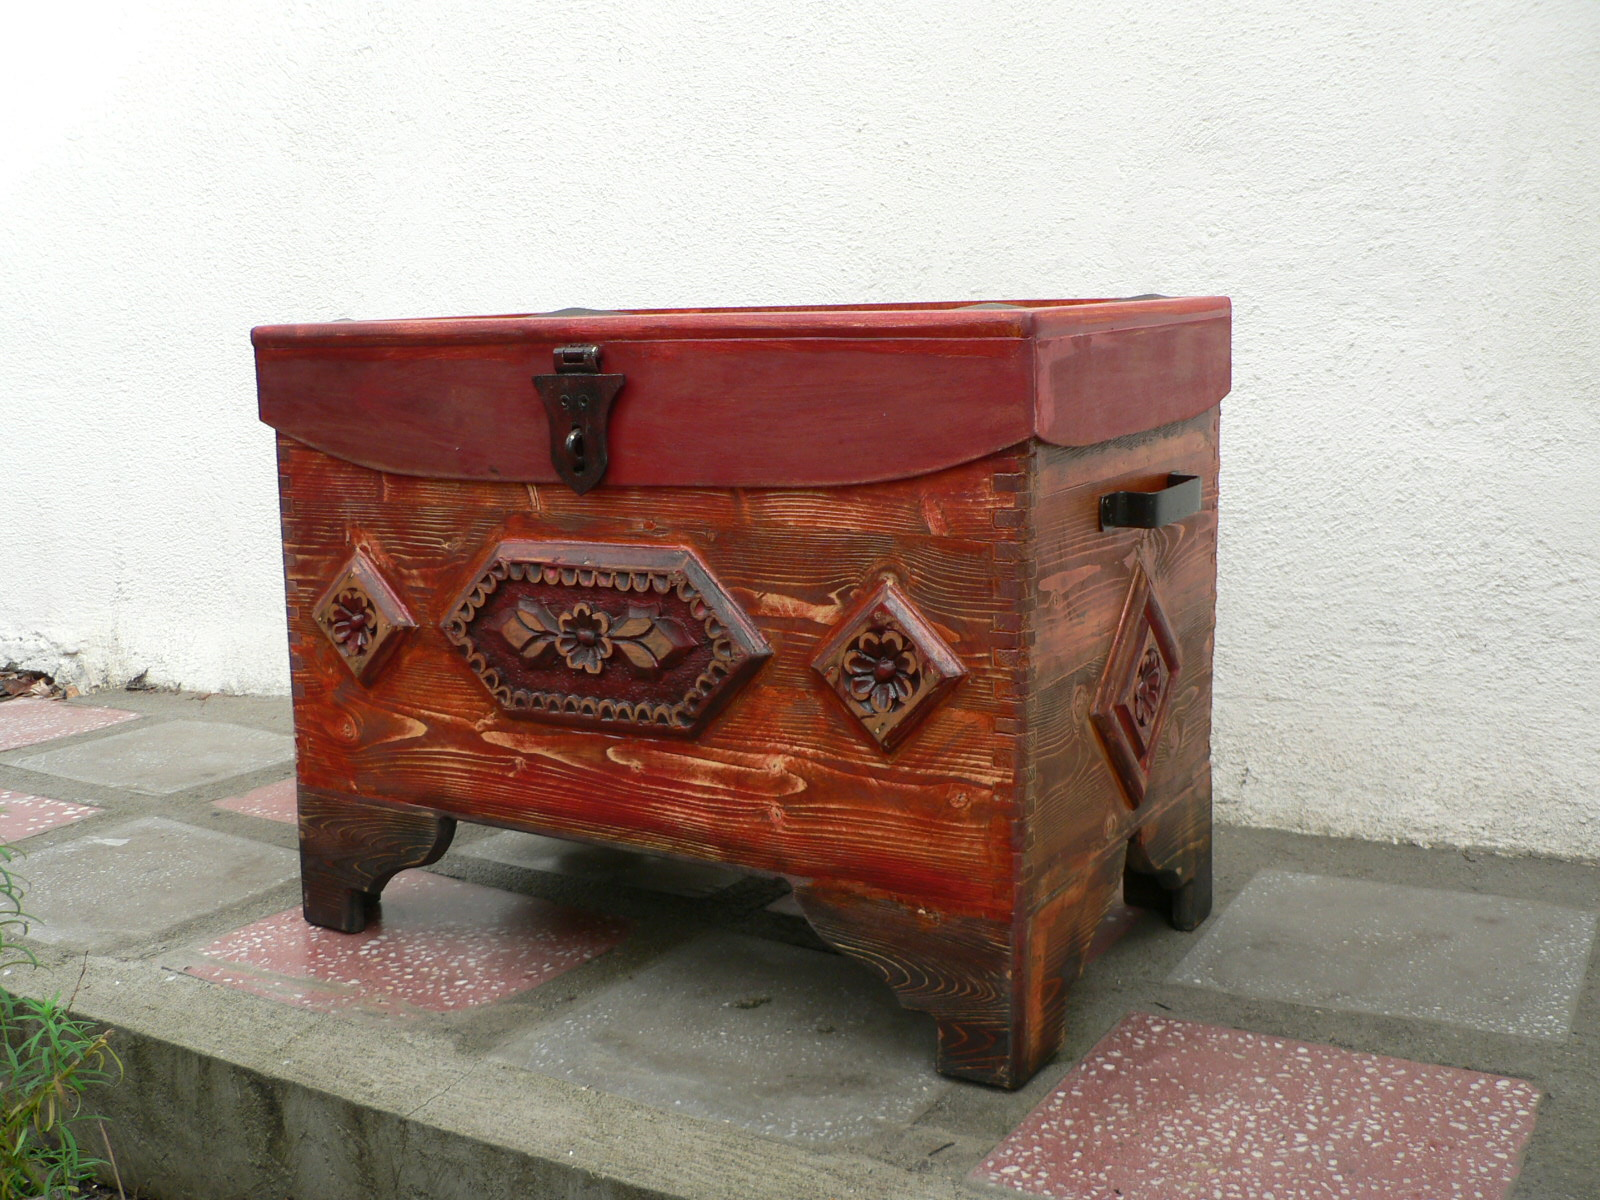 CUFAR-lemn de brad si tei sculptat.Dim.90x54x60cm